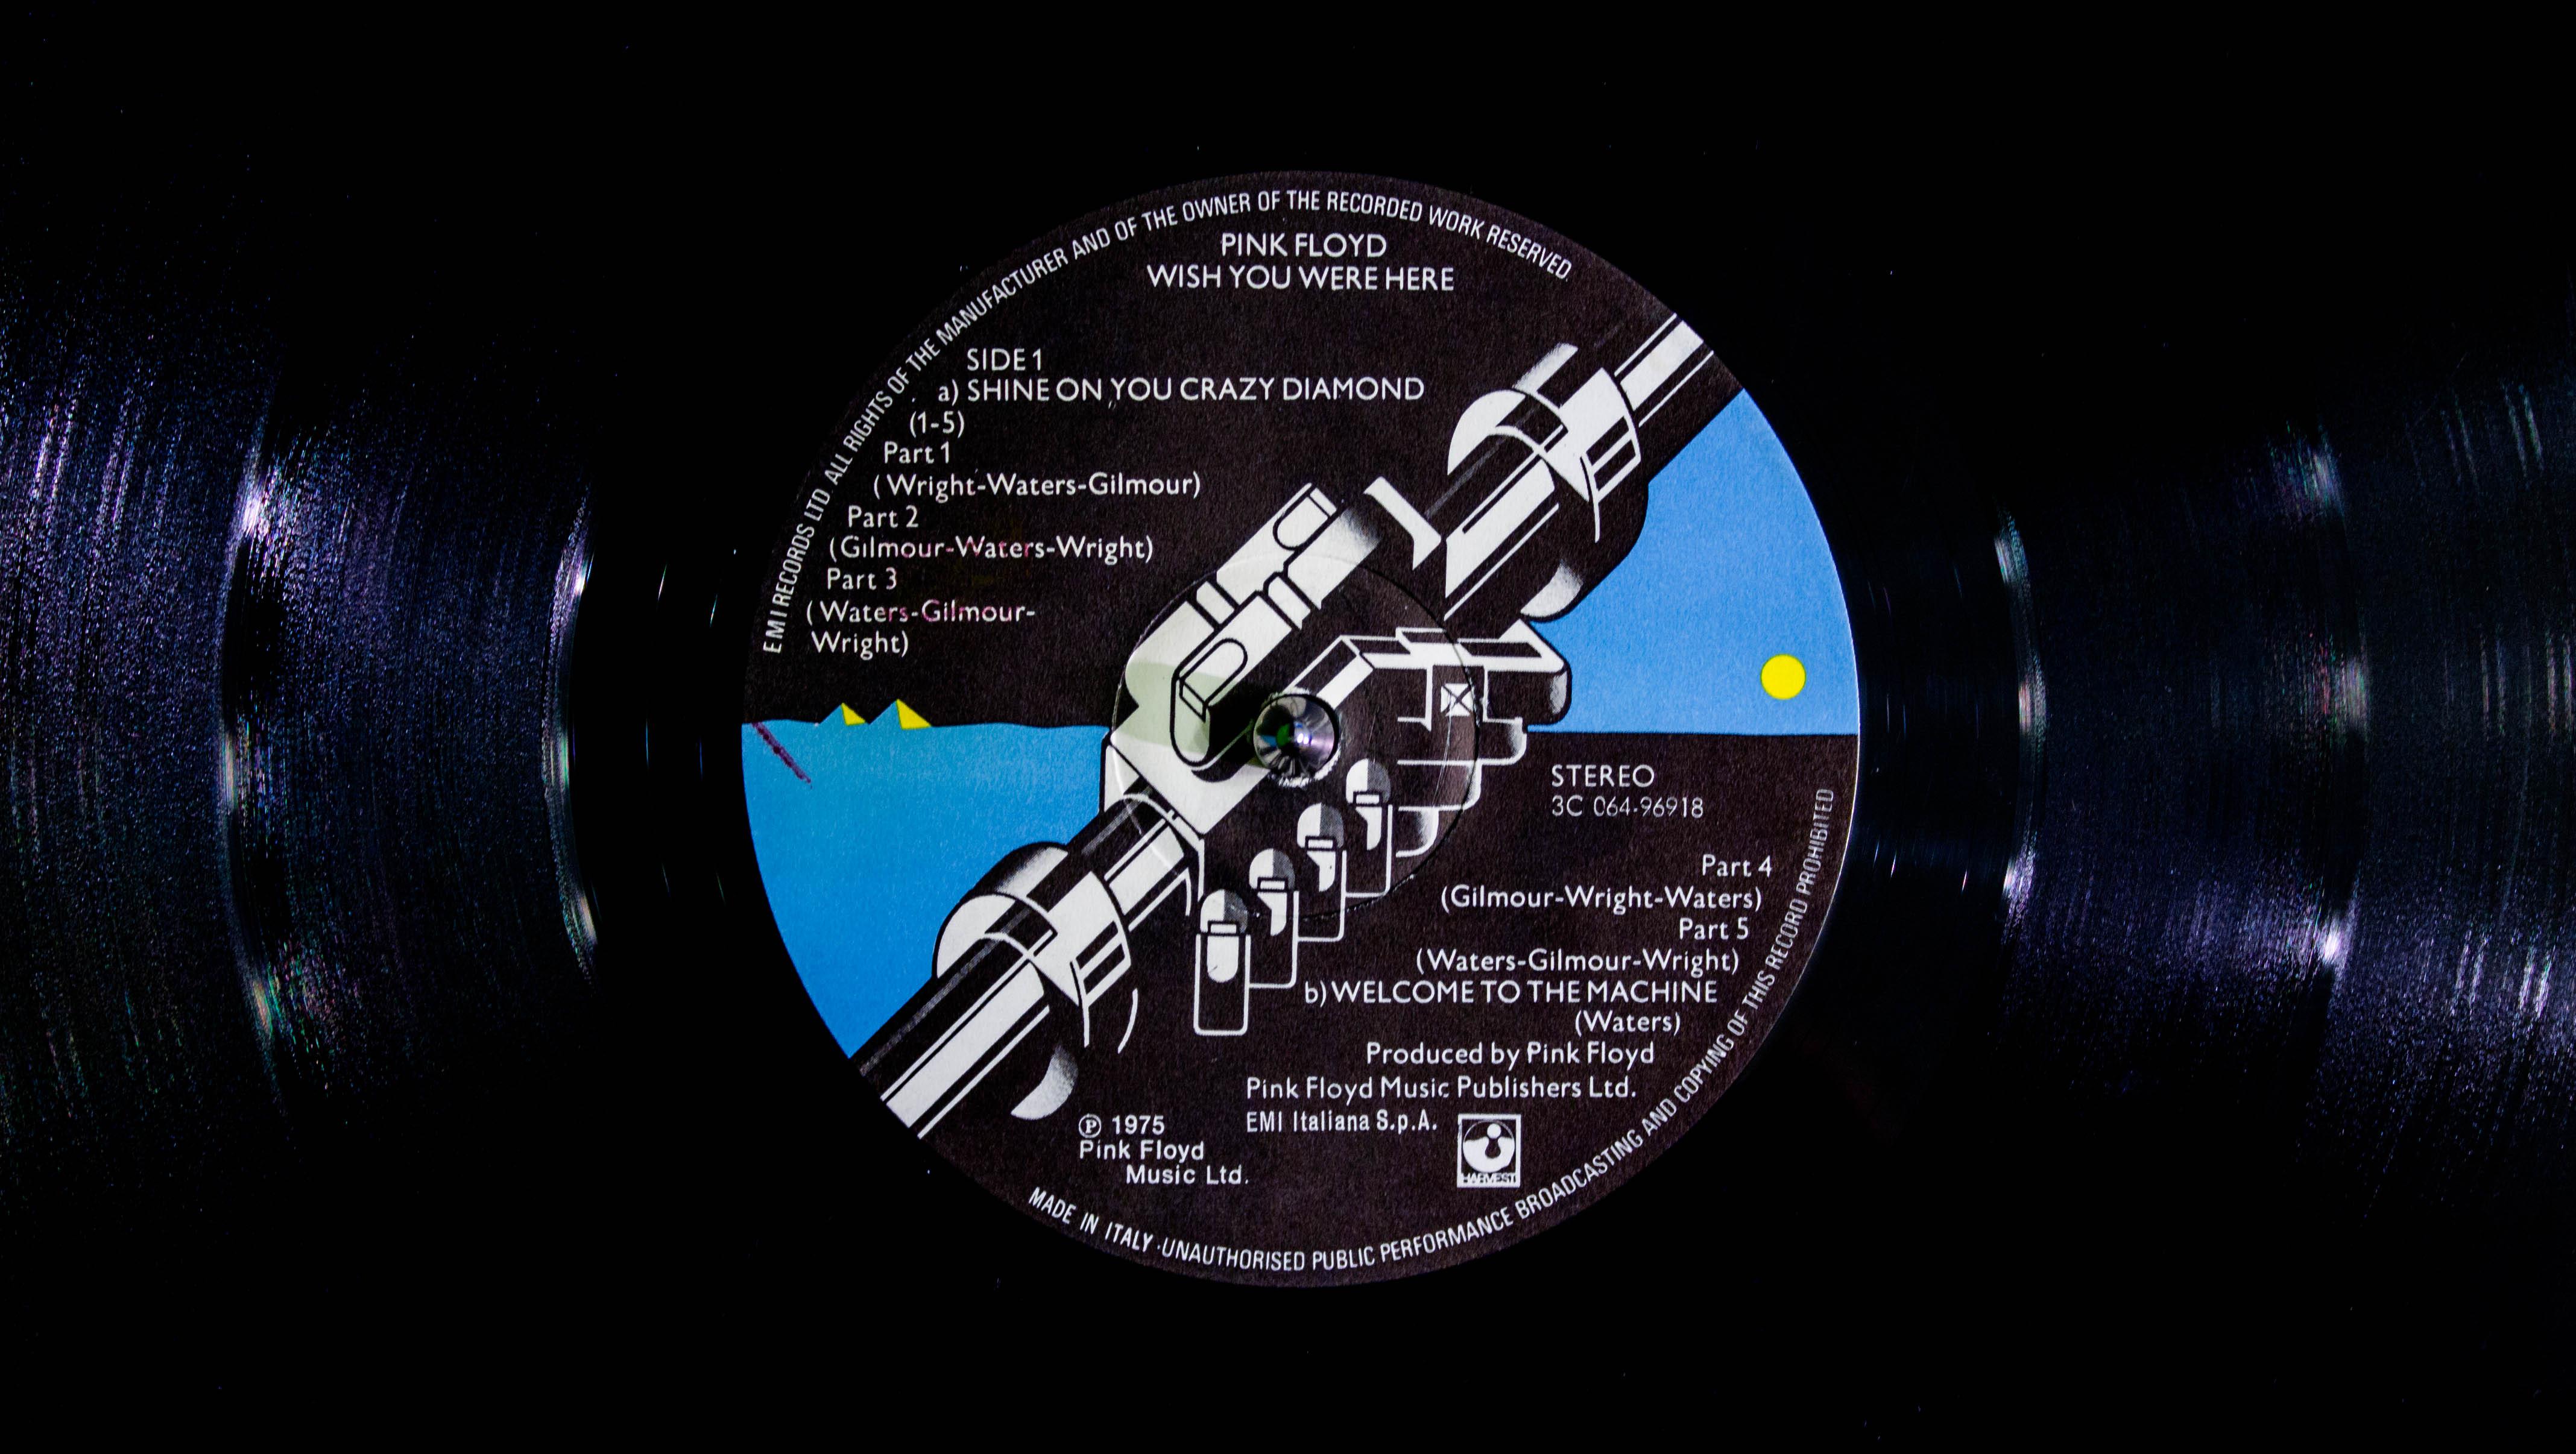 Wallpaper Pink Floyd Vinyl 4272x2412 Terence5555